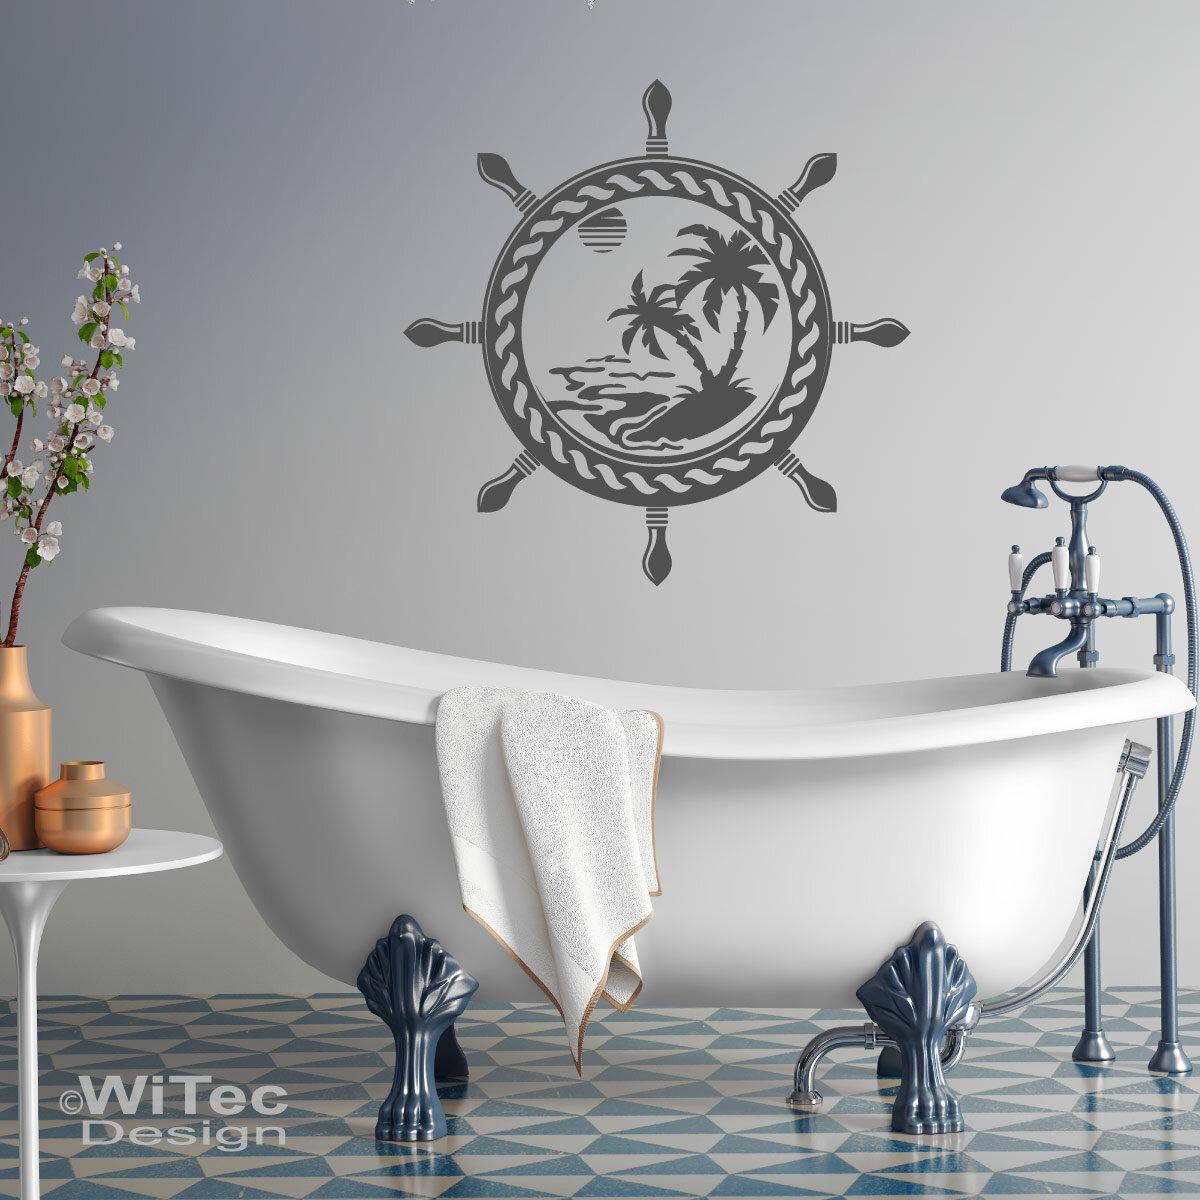 Wandtattoo Steuerrad Südsee Badezimmer Wandaufkleber